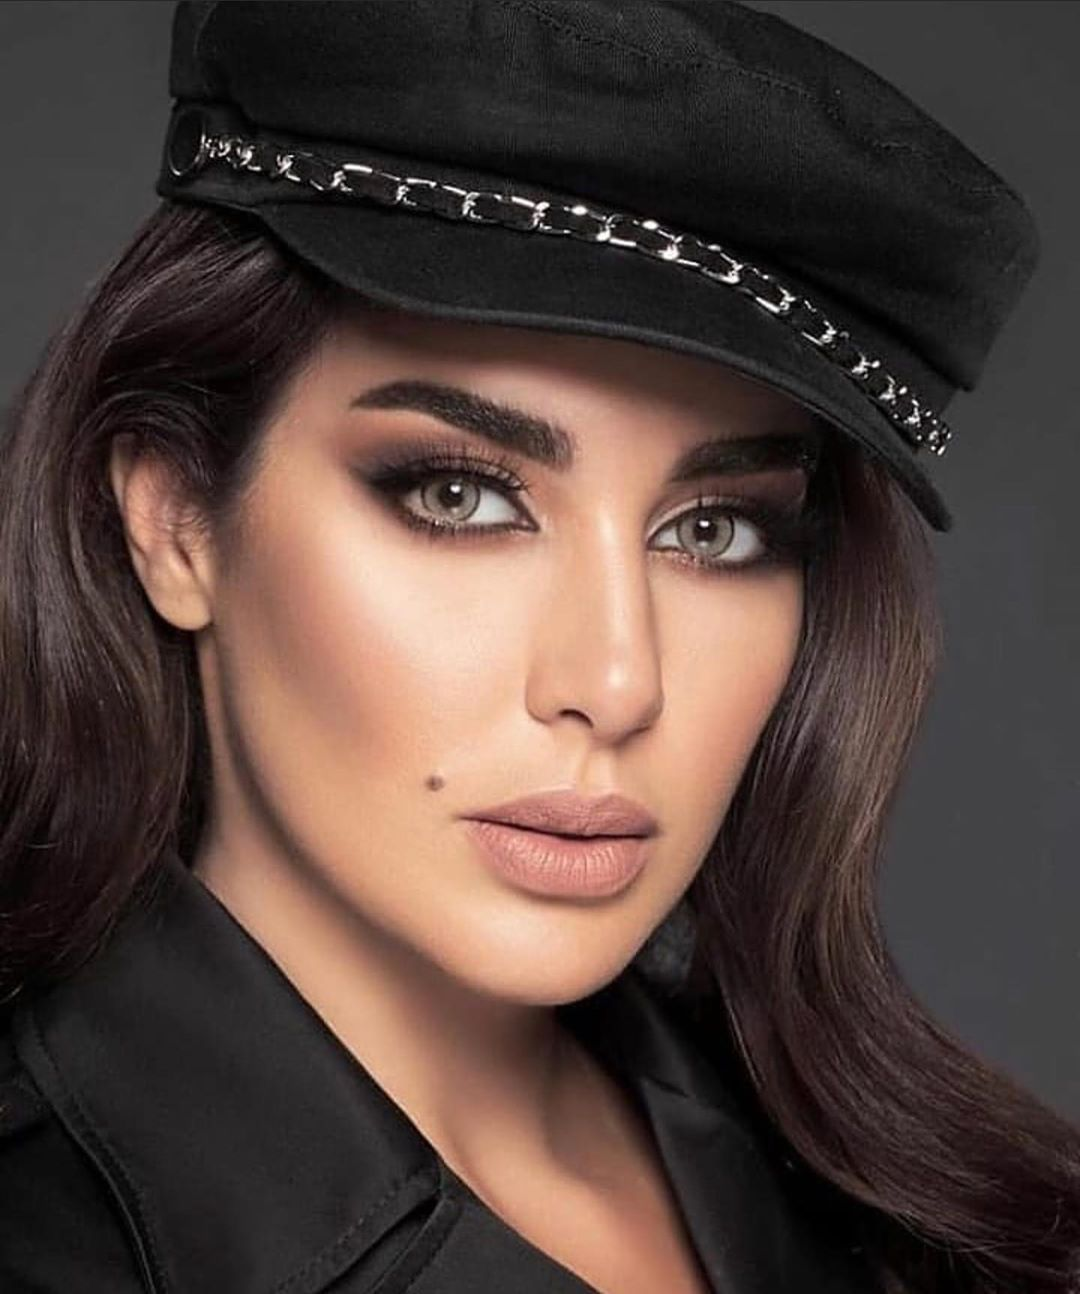 38 Likes 37 Comments Yasmine Sabri ياسمين صبرى Yasmiine Sabrii On Instagram صباحكم خي Arab Celebrities Beautiful Women Naturally Egyptian Actress